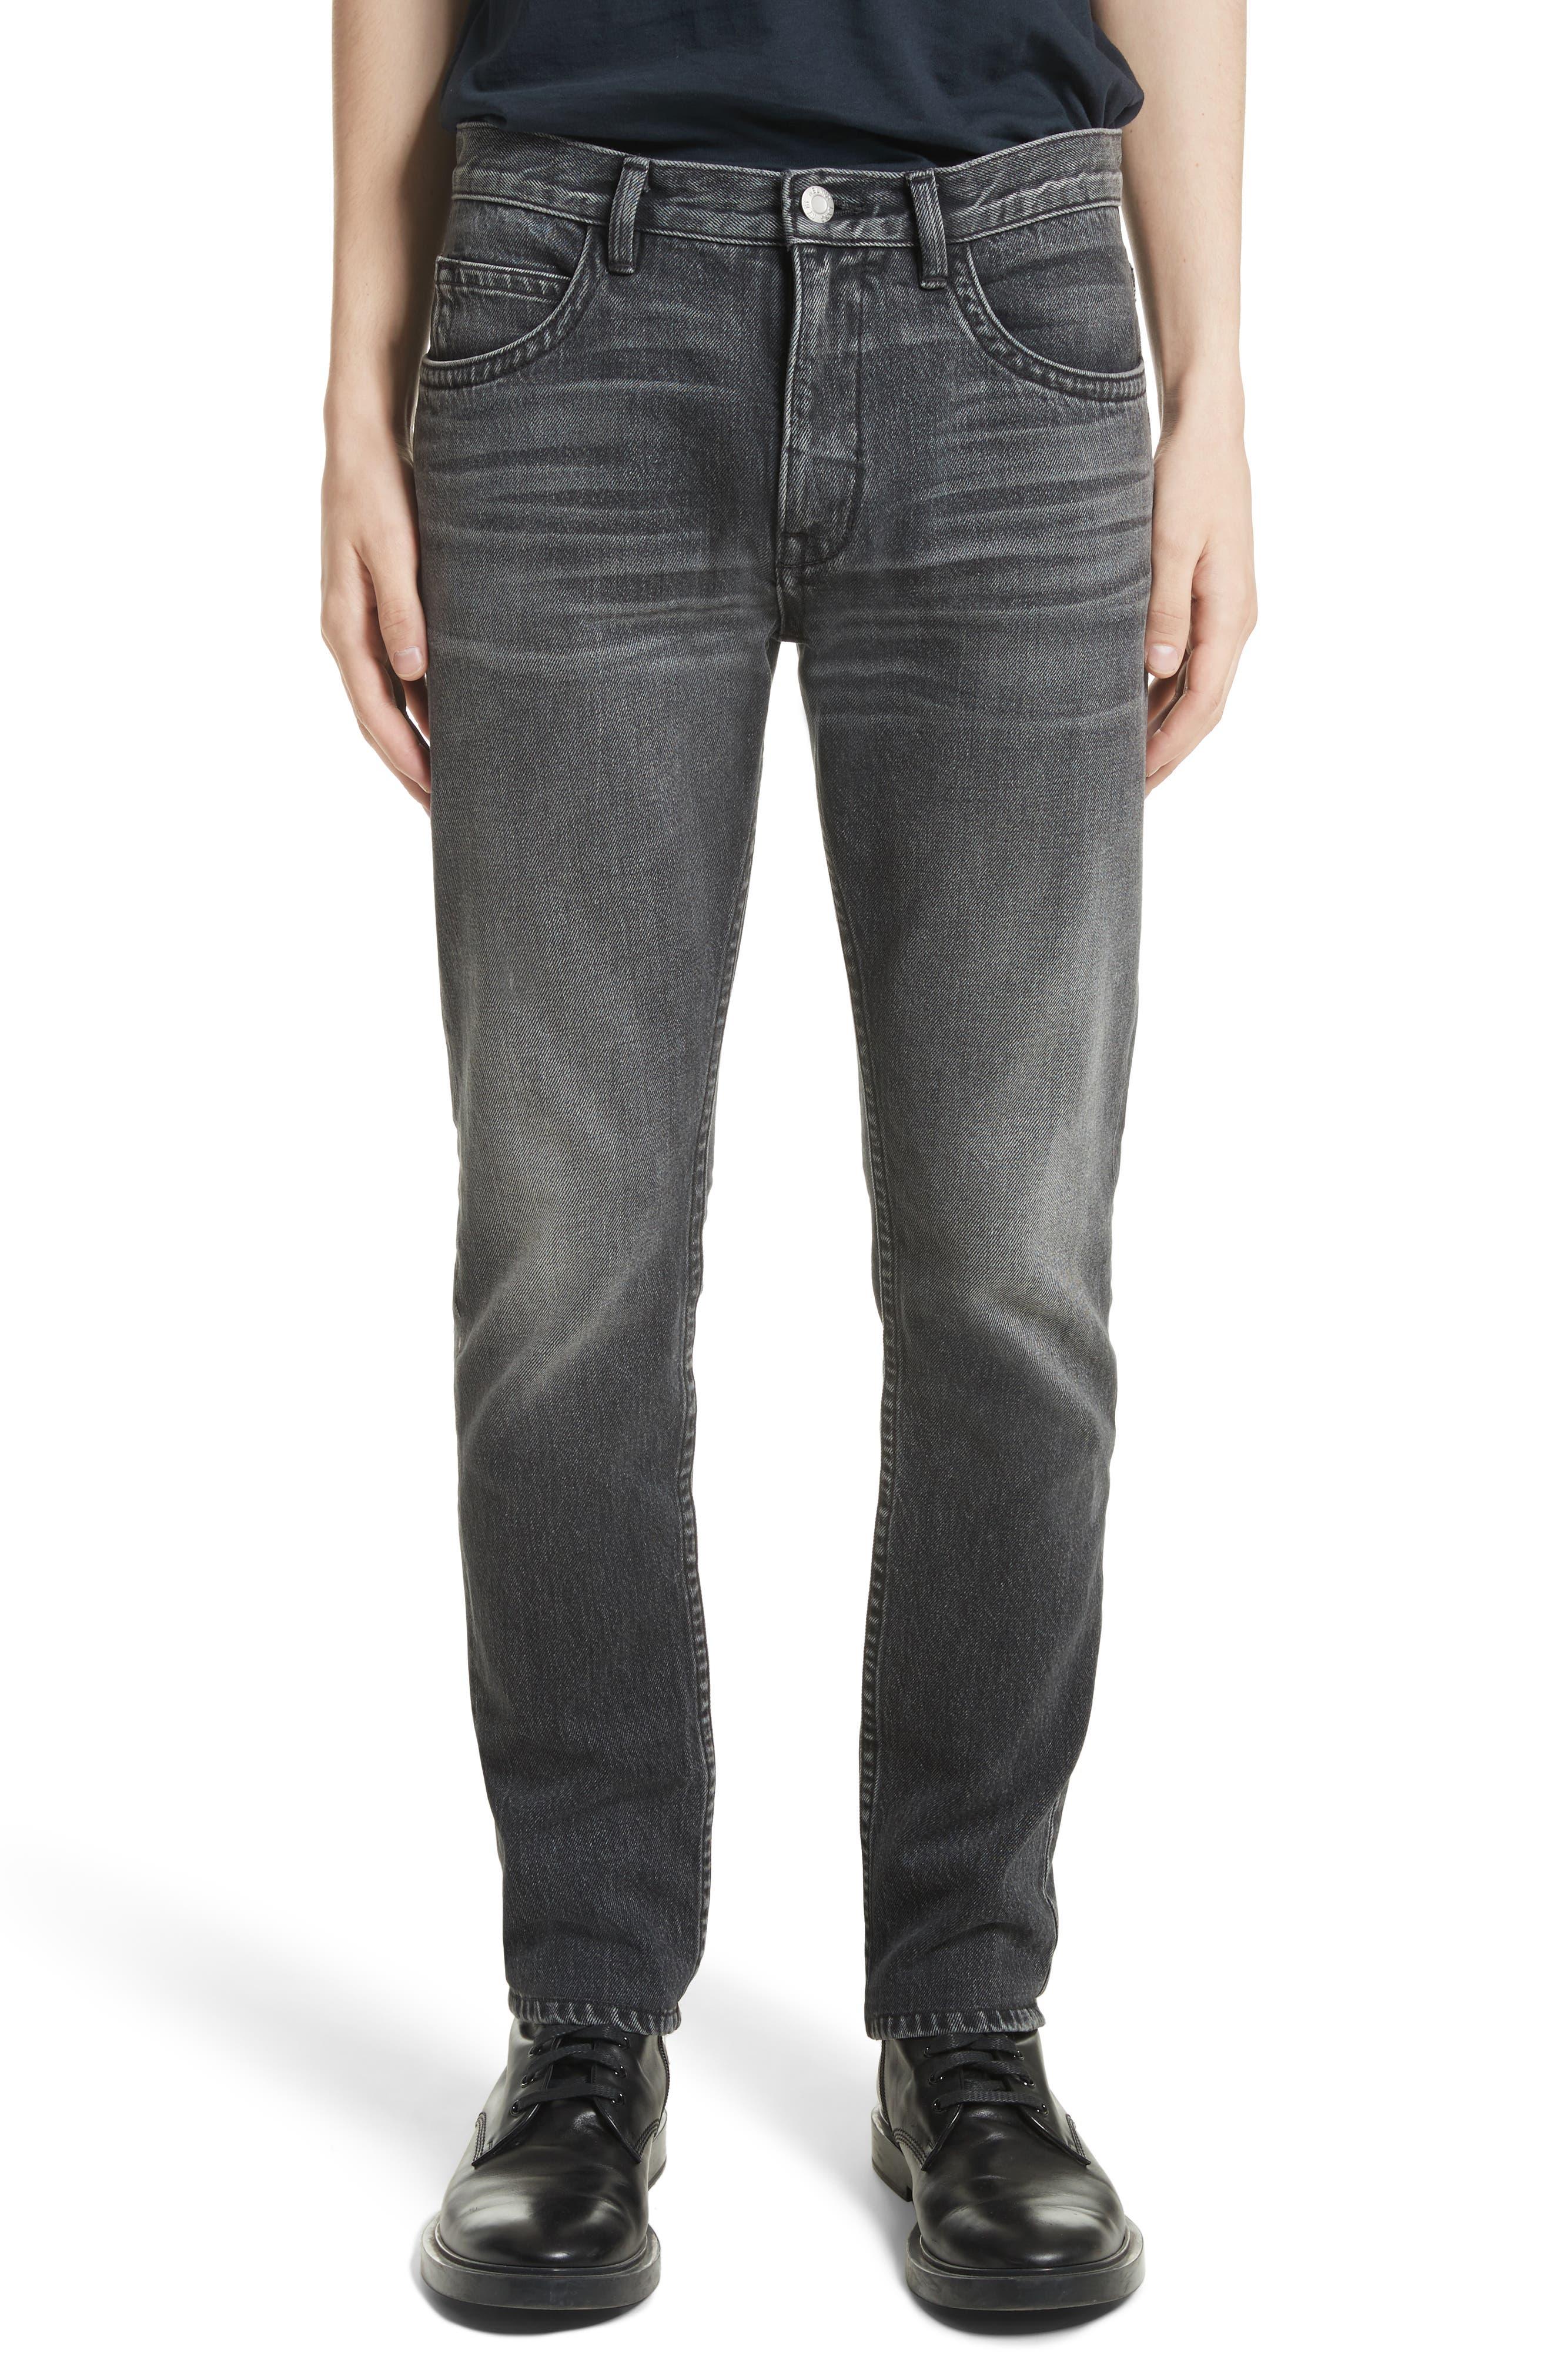 Helmut Lang Jeans (Coal)